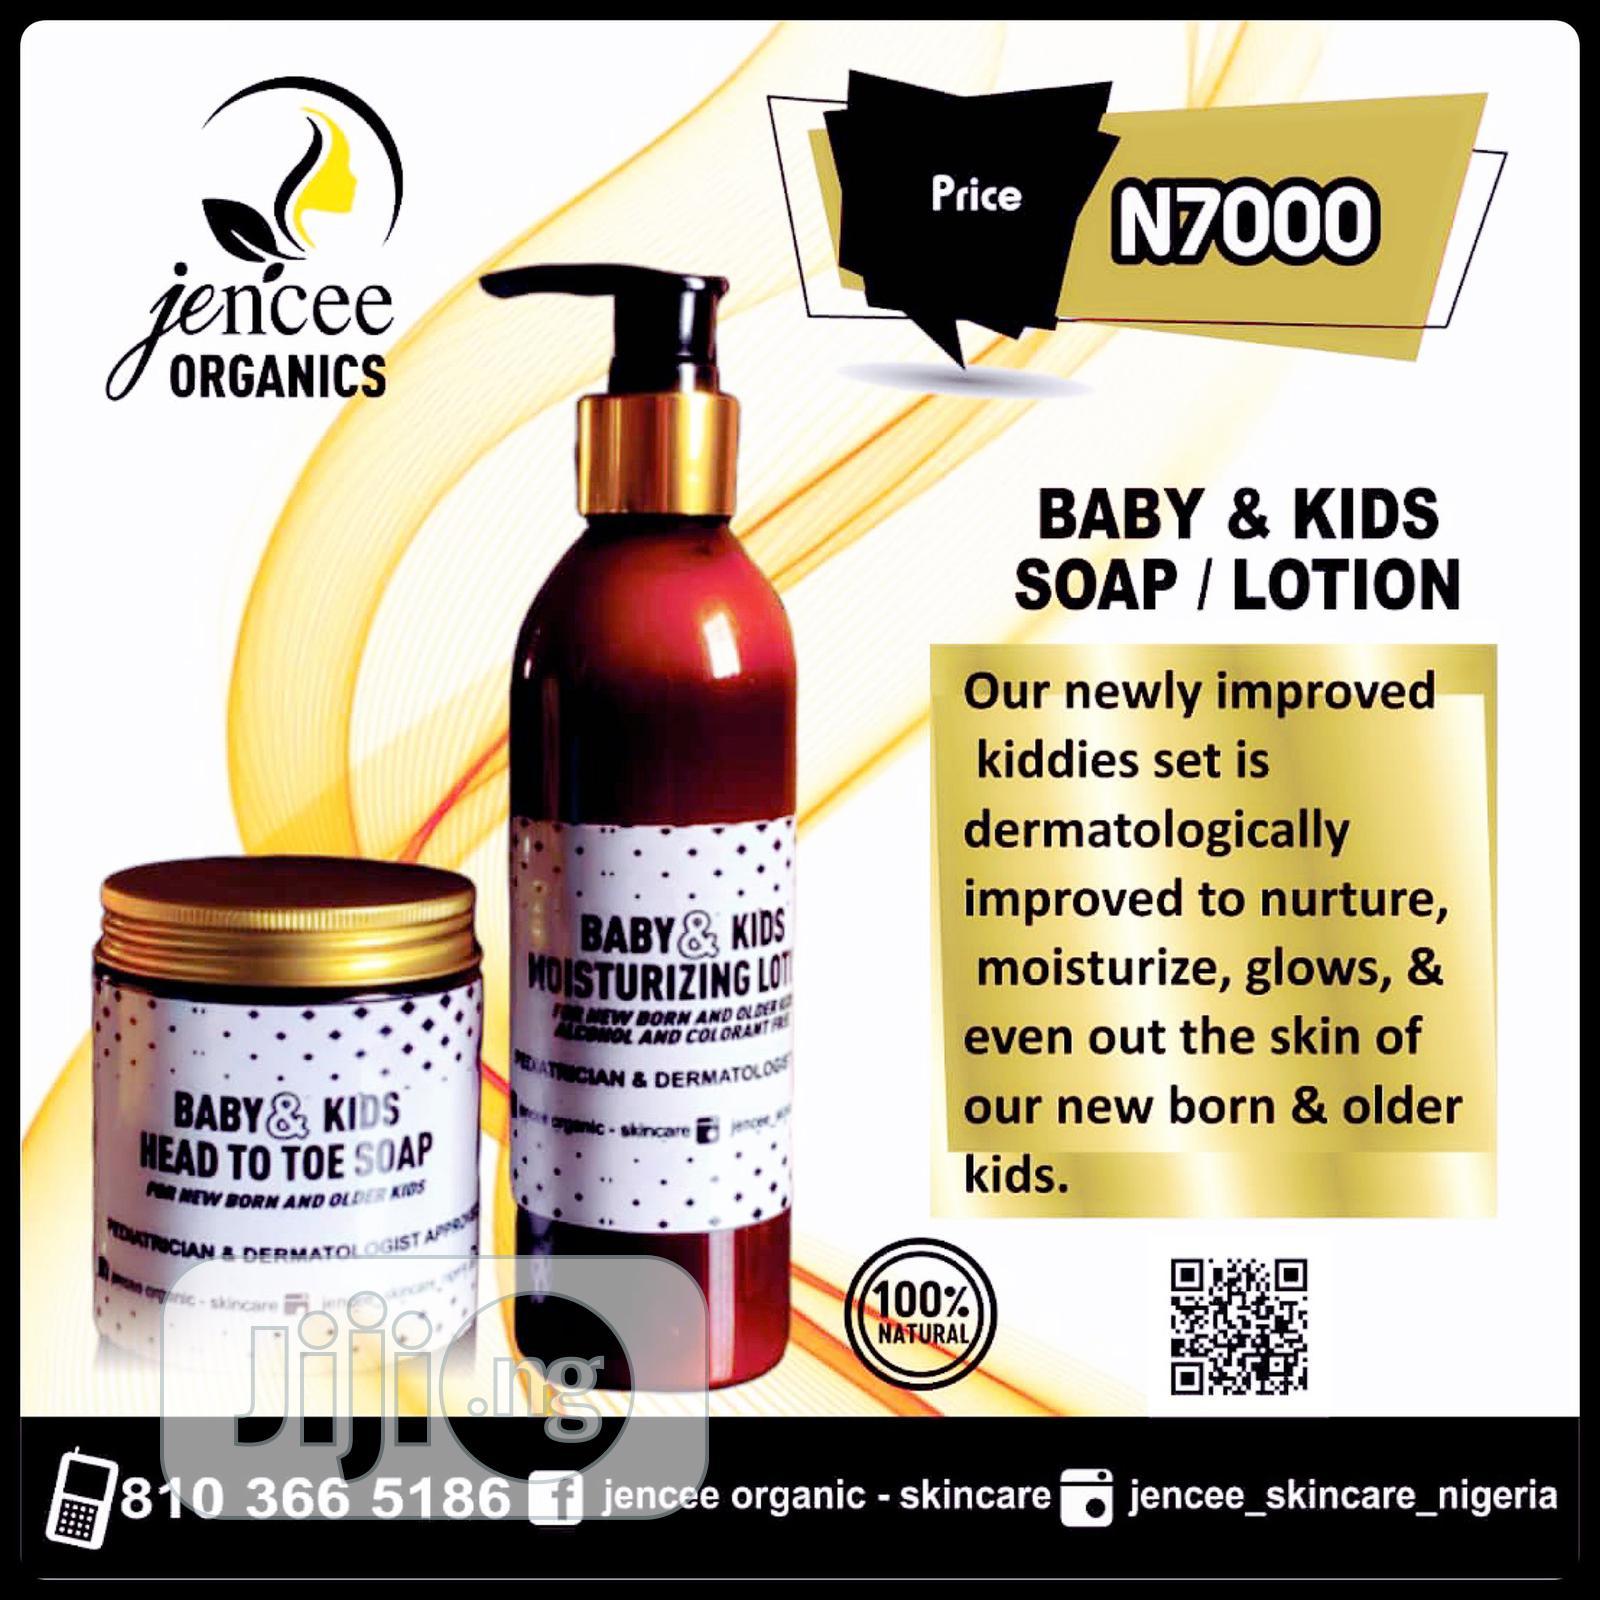 Kiddies Moisturizing Lotion and Soap